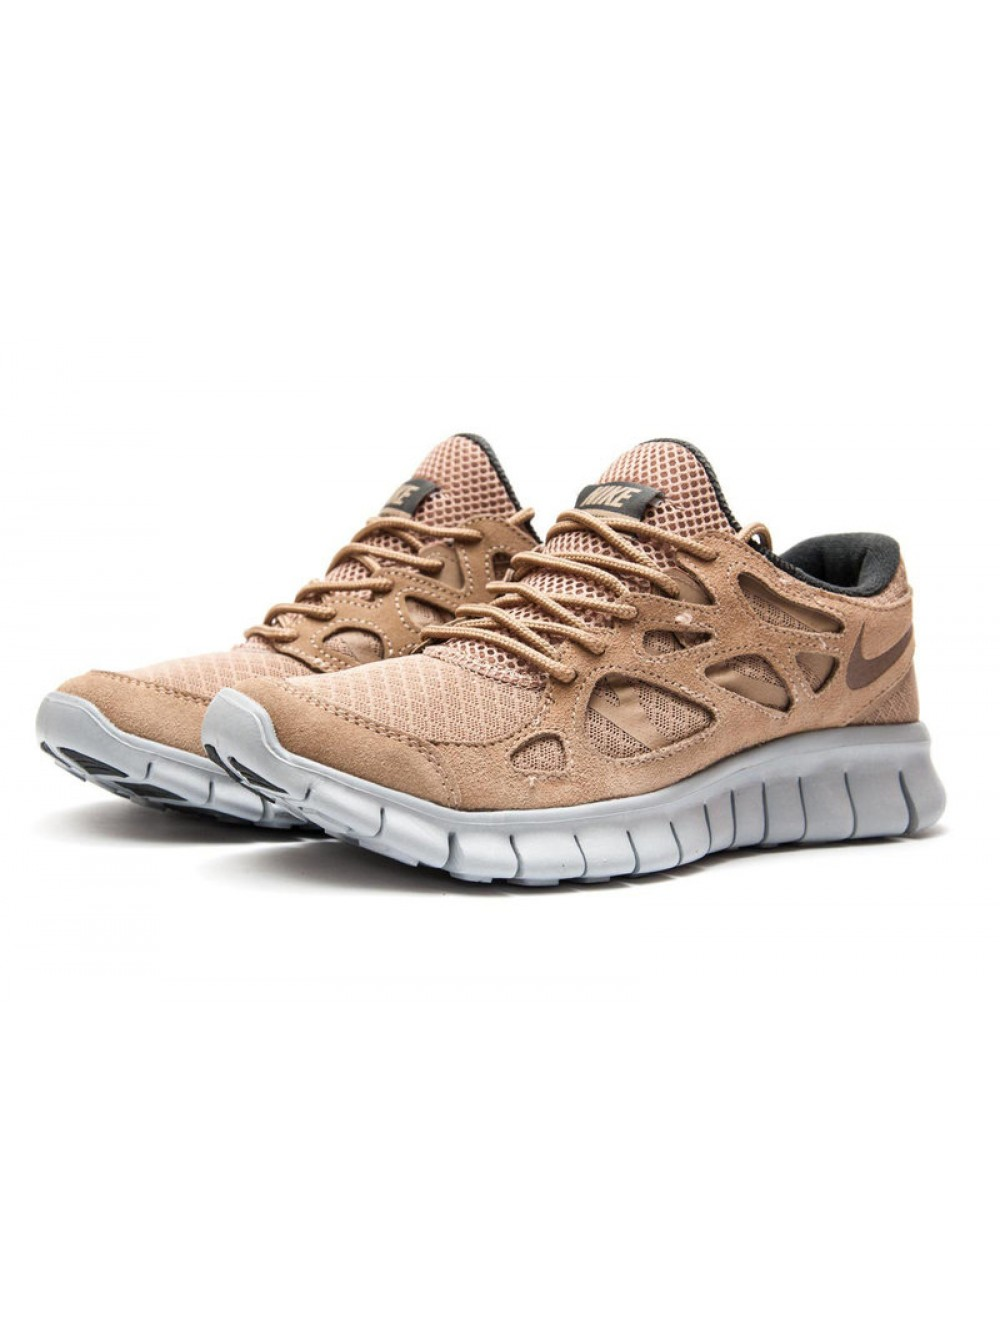 d8770577 Кроссовки для бега Nike Free Run, Коричневый, 13443, 41-45р. Купить